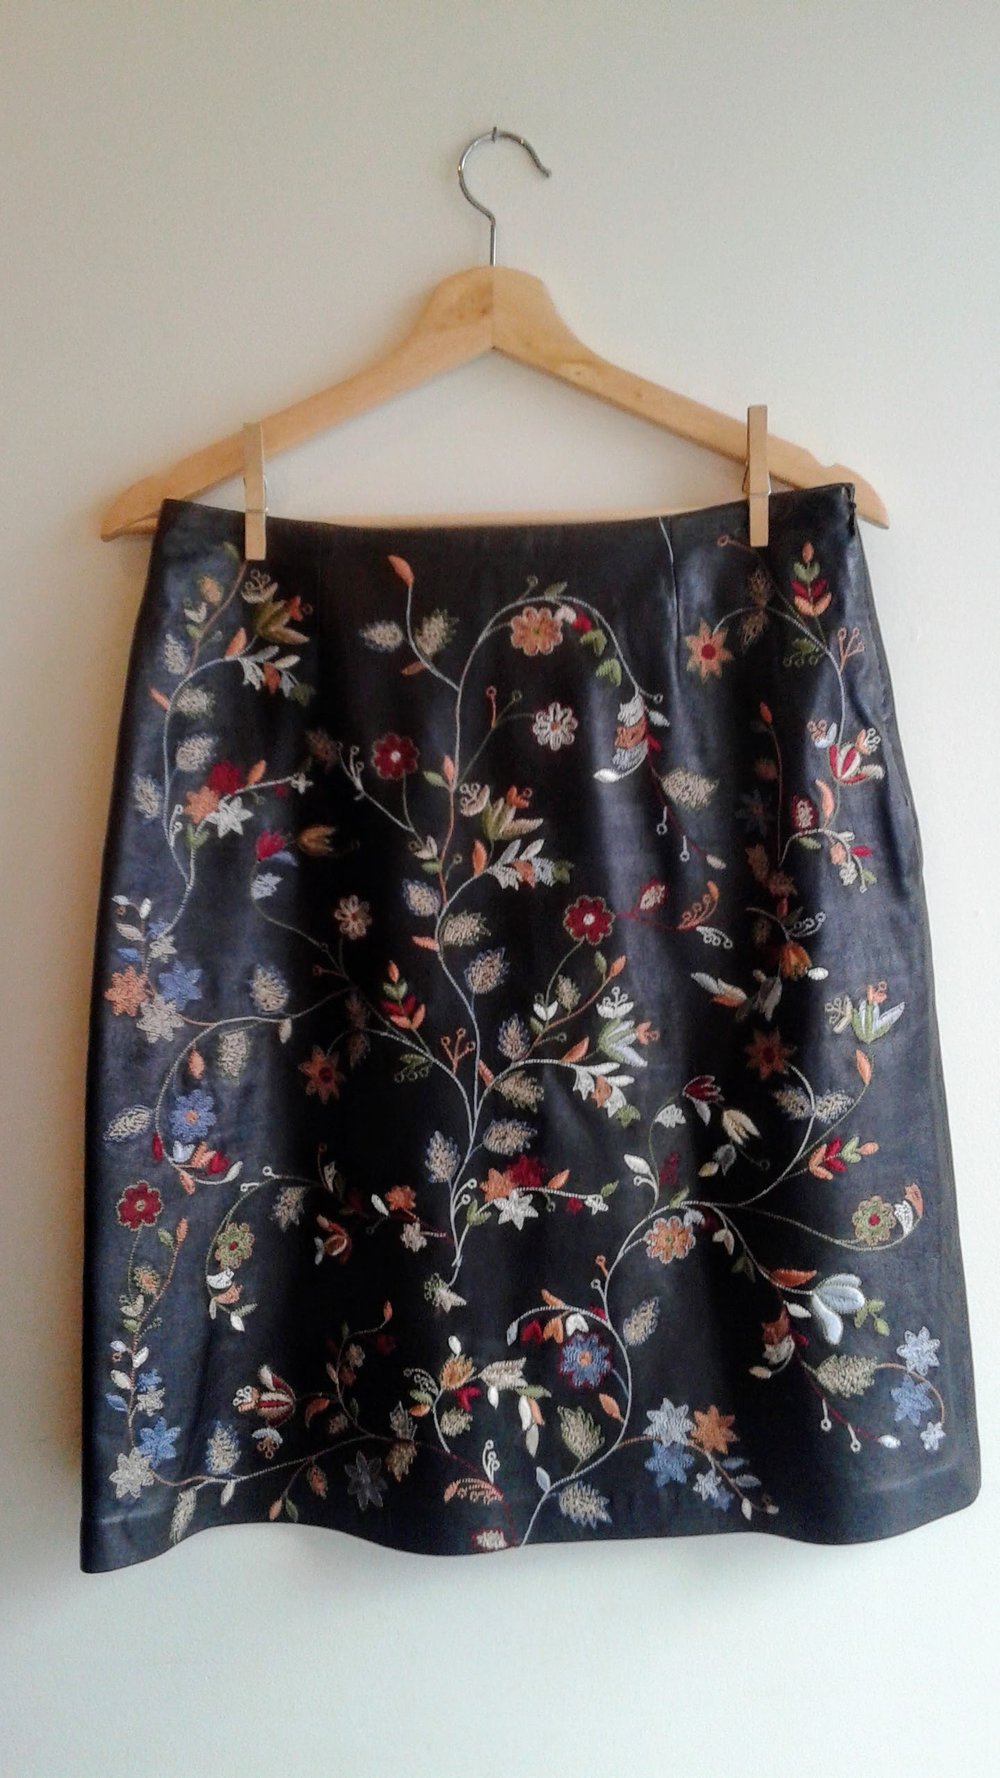 Danier leather skirt; Size 8, $48